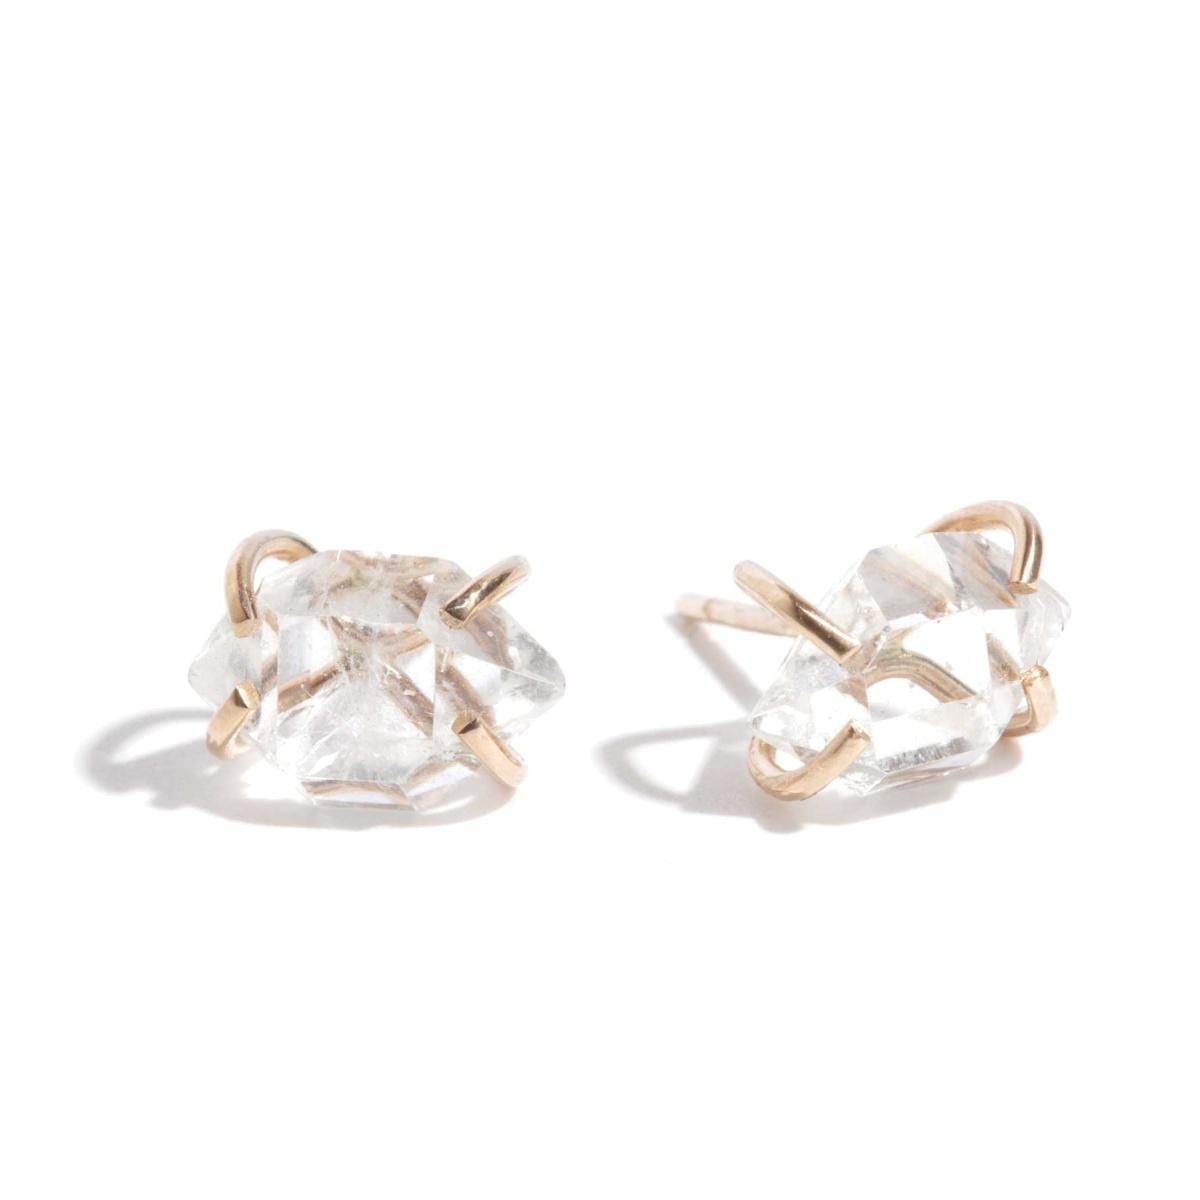 Melissa joy manning Herkimer Diamond Stud Earrings in Gold ...